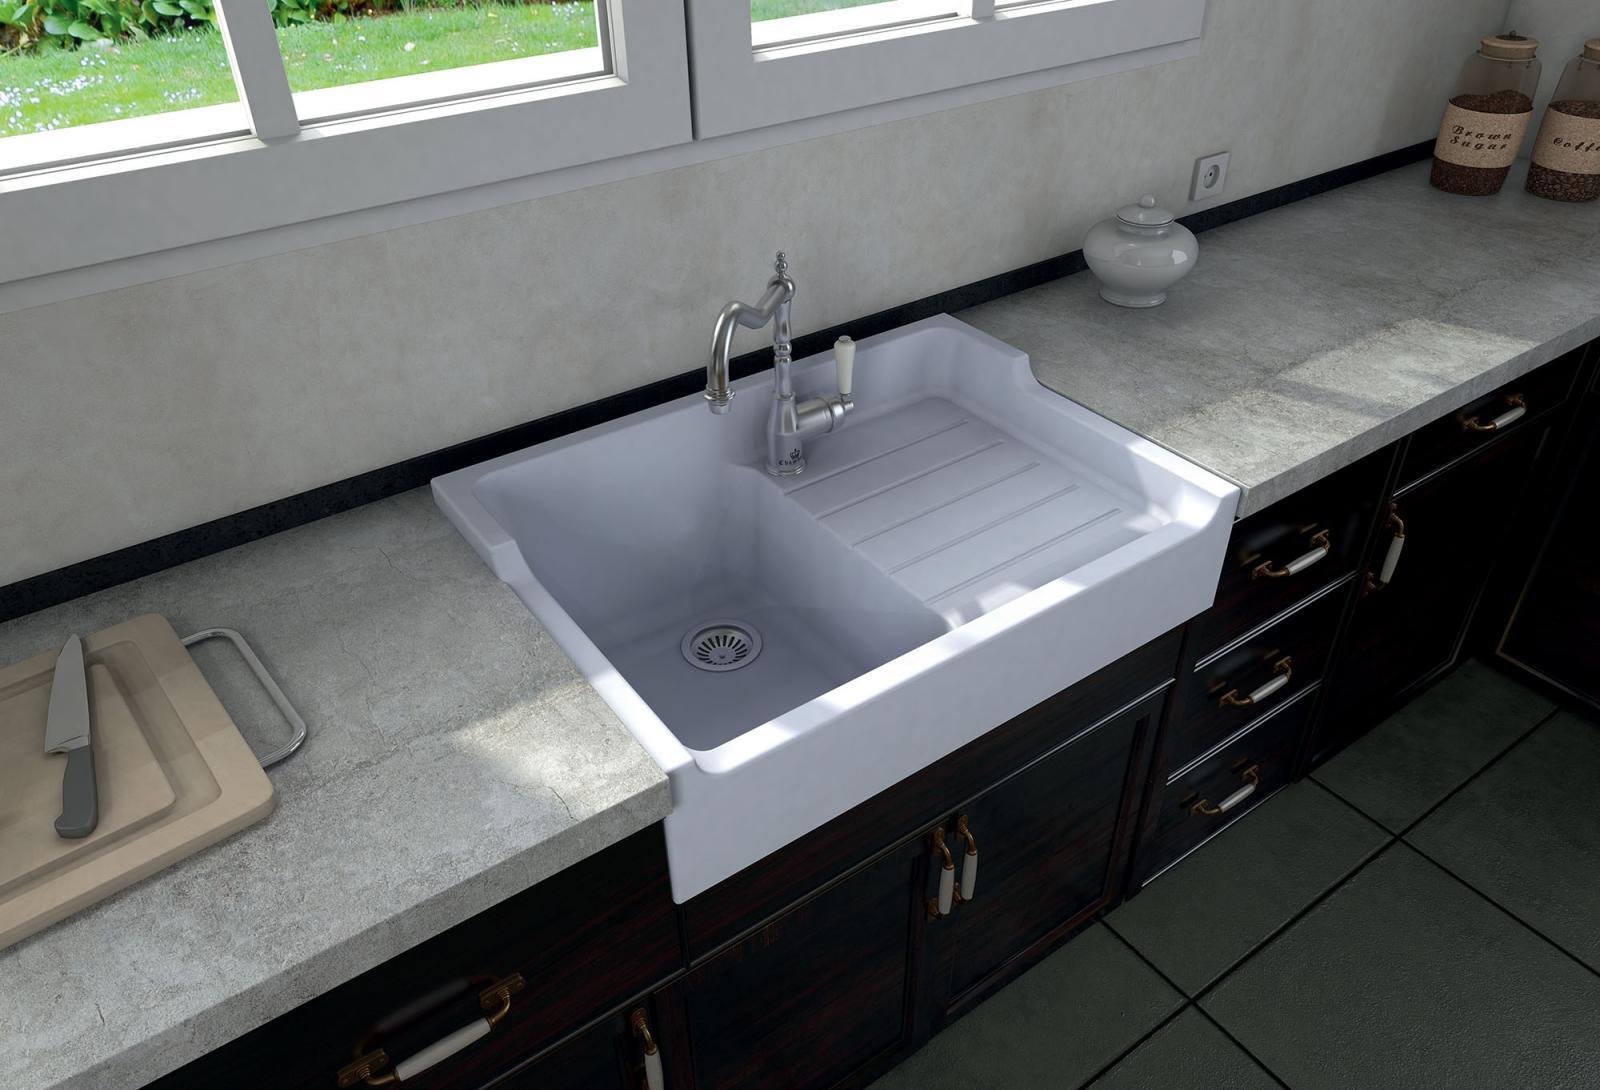 High-quality sink Francois 1 - single bowl, ceramic - ambience 1